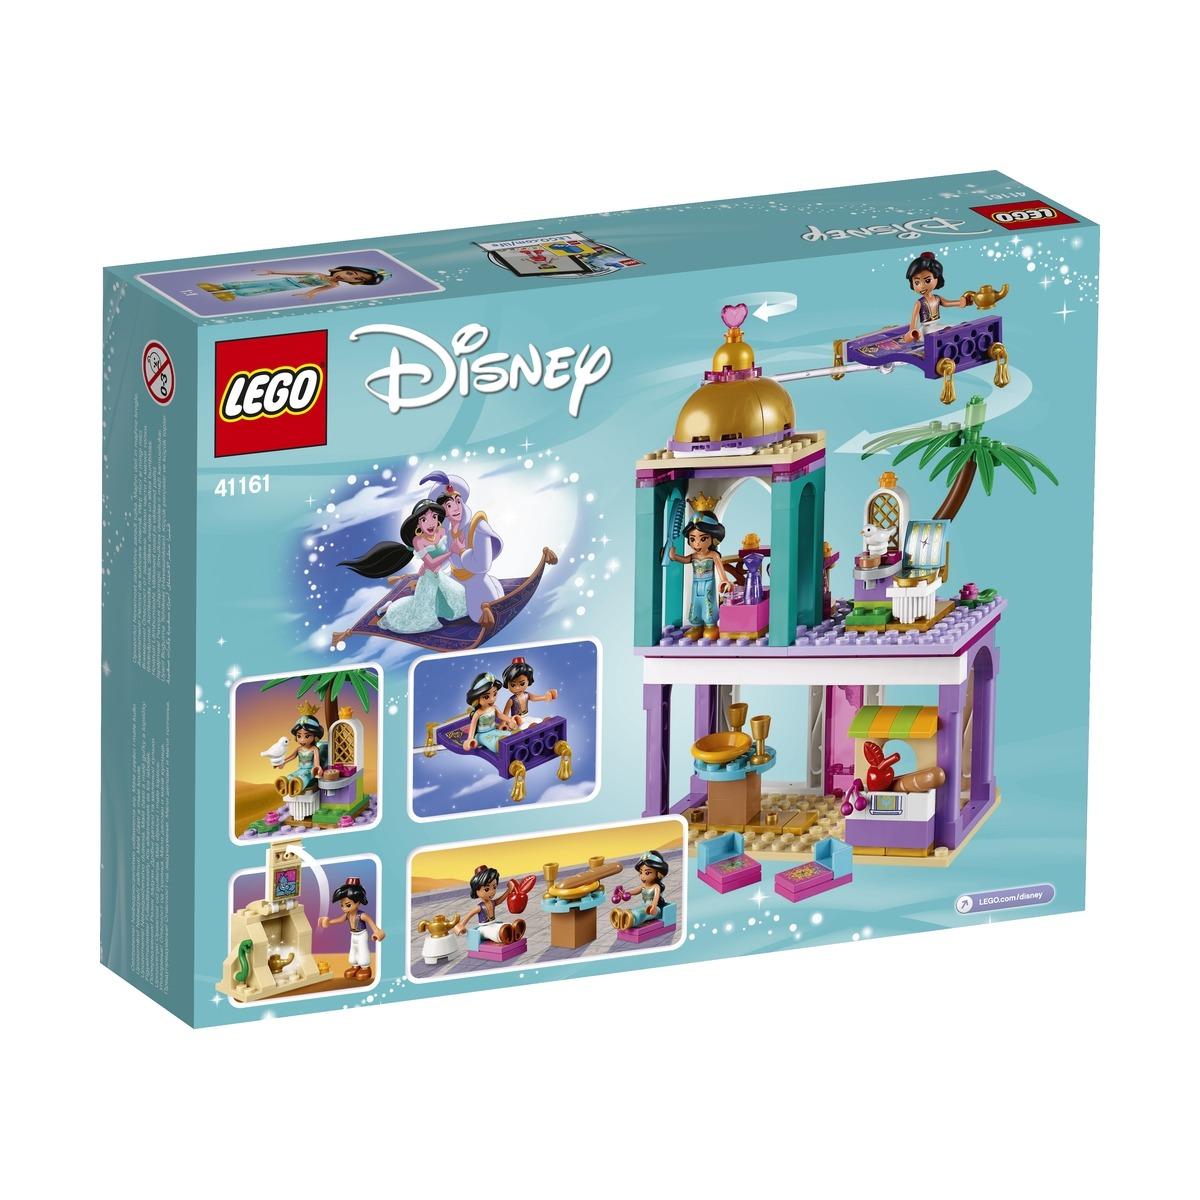 b9d6ad59aa LEGO Disney Aladdin and Jasmine's Palace Adventures - 41161 | Kmart